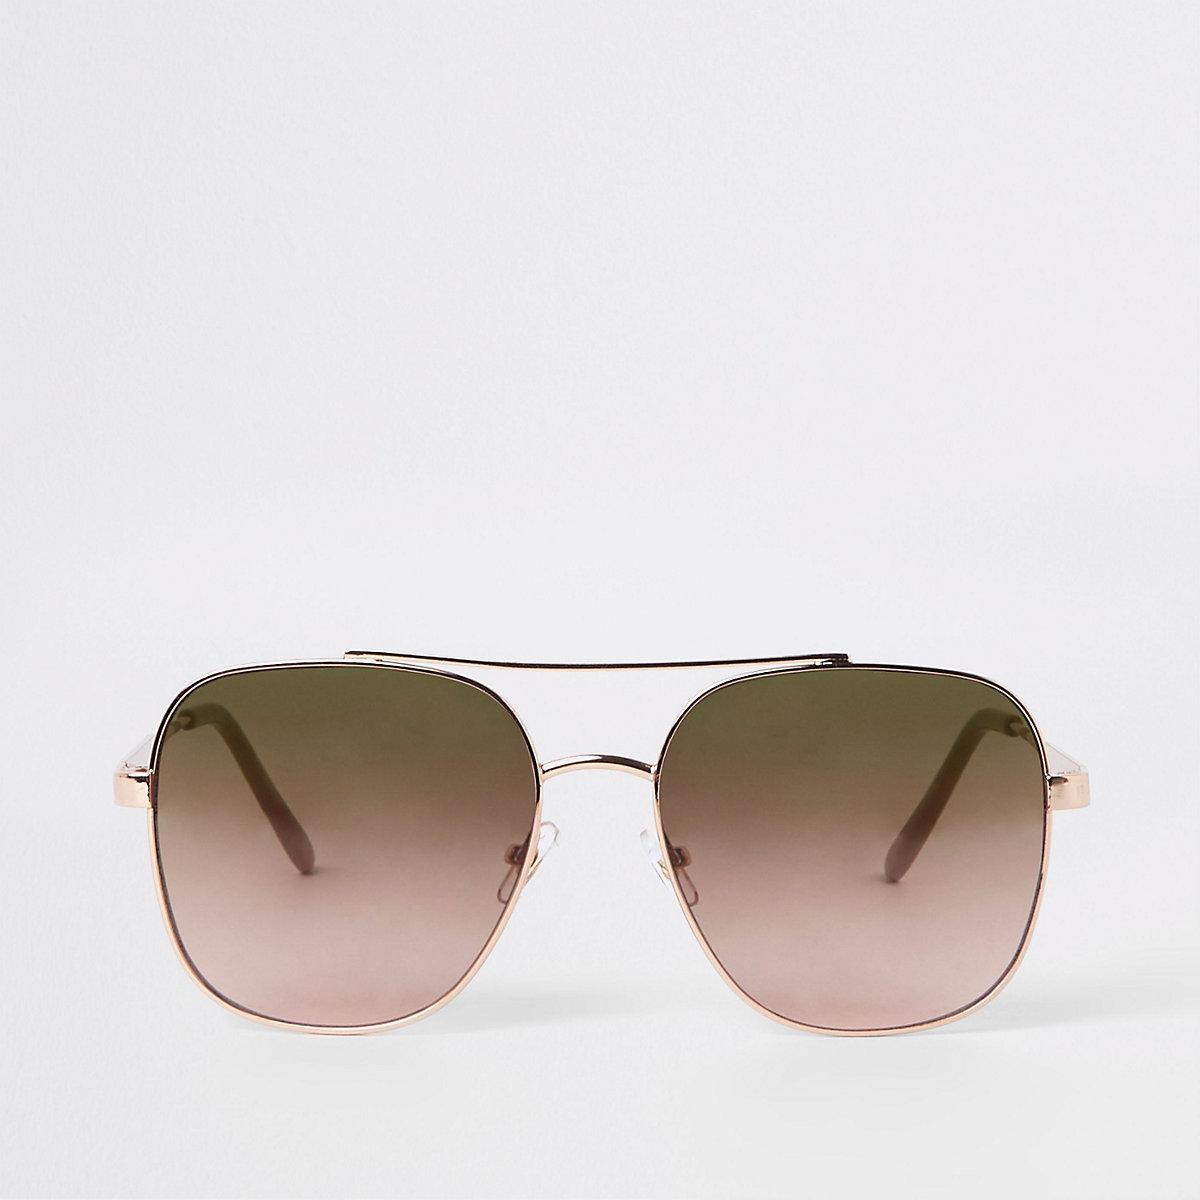 Gold tone square aviator sunglasses